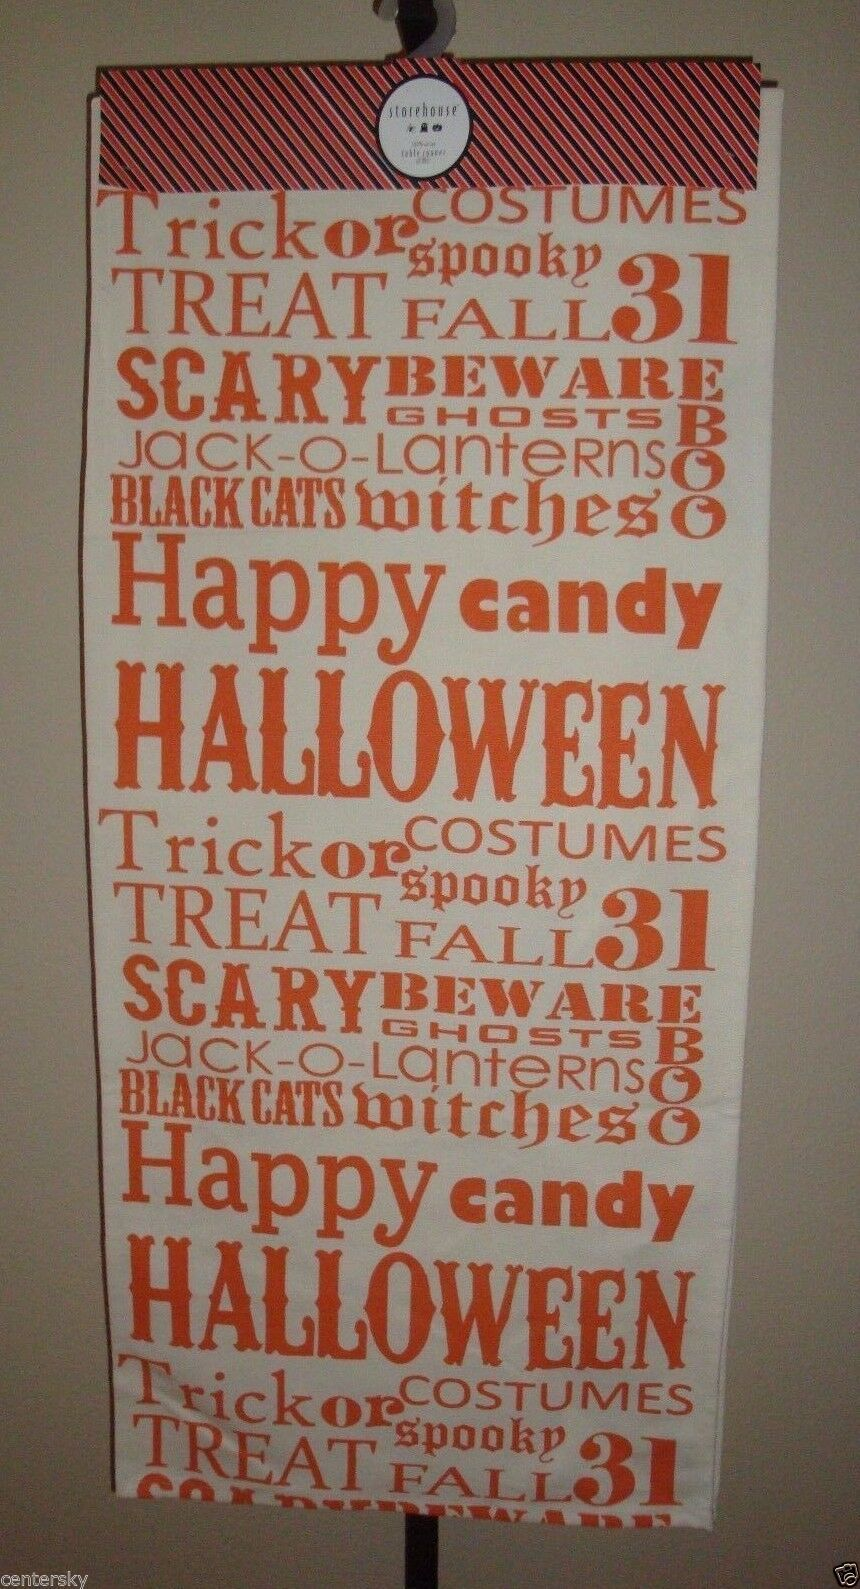 "New Storehouse 100% Cotton Table Runner 18"" x 80"" Halloween Theme Ivory/Orange"